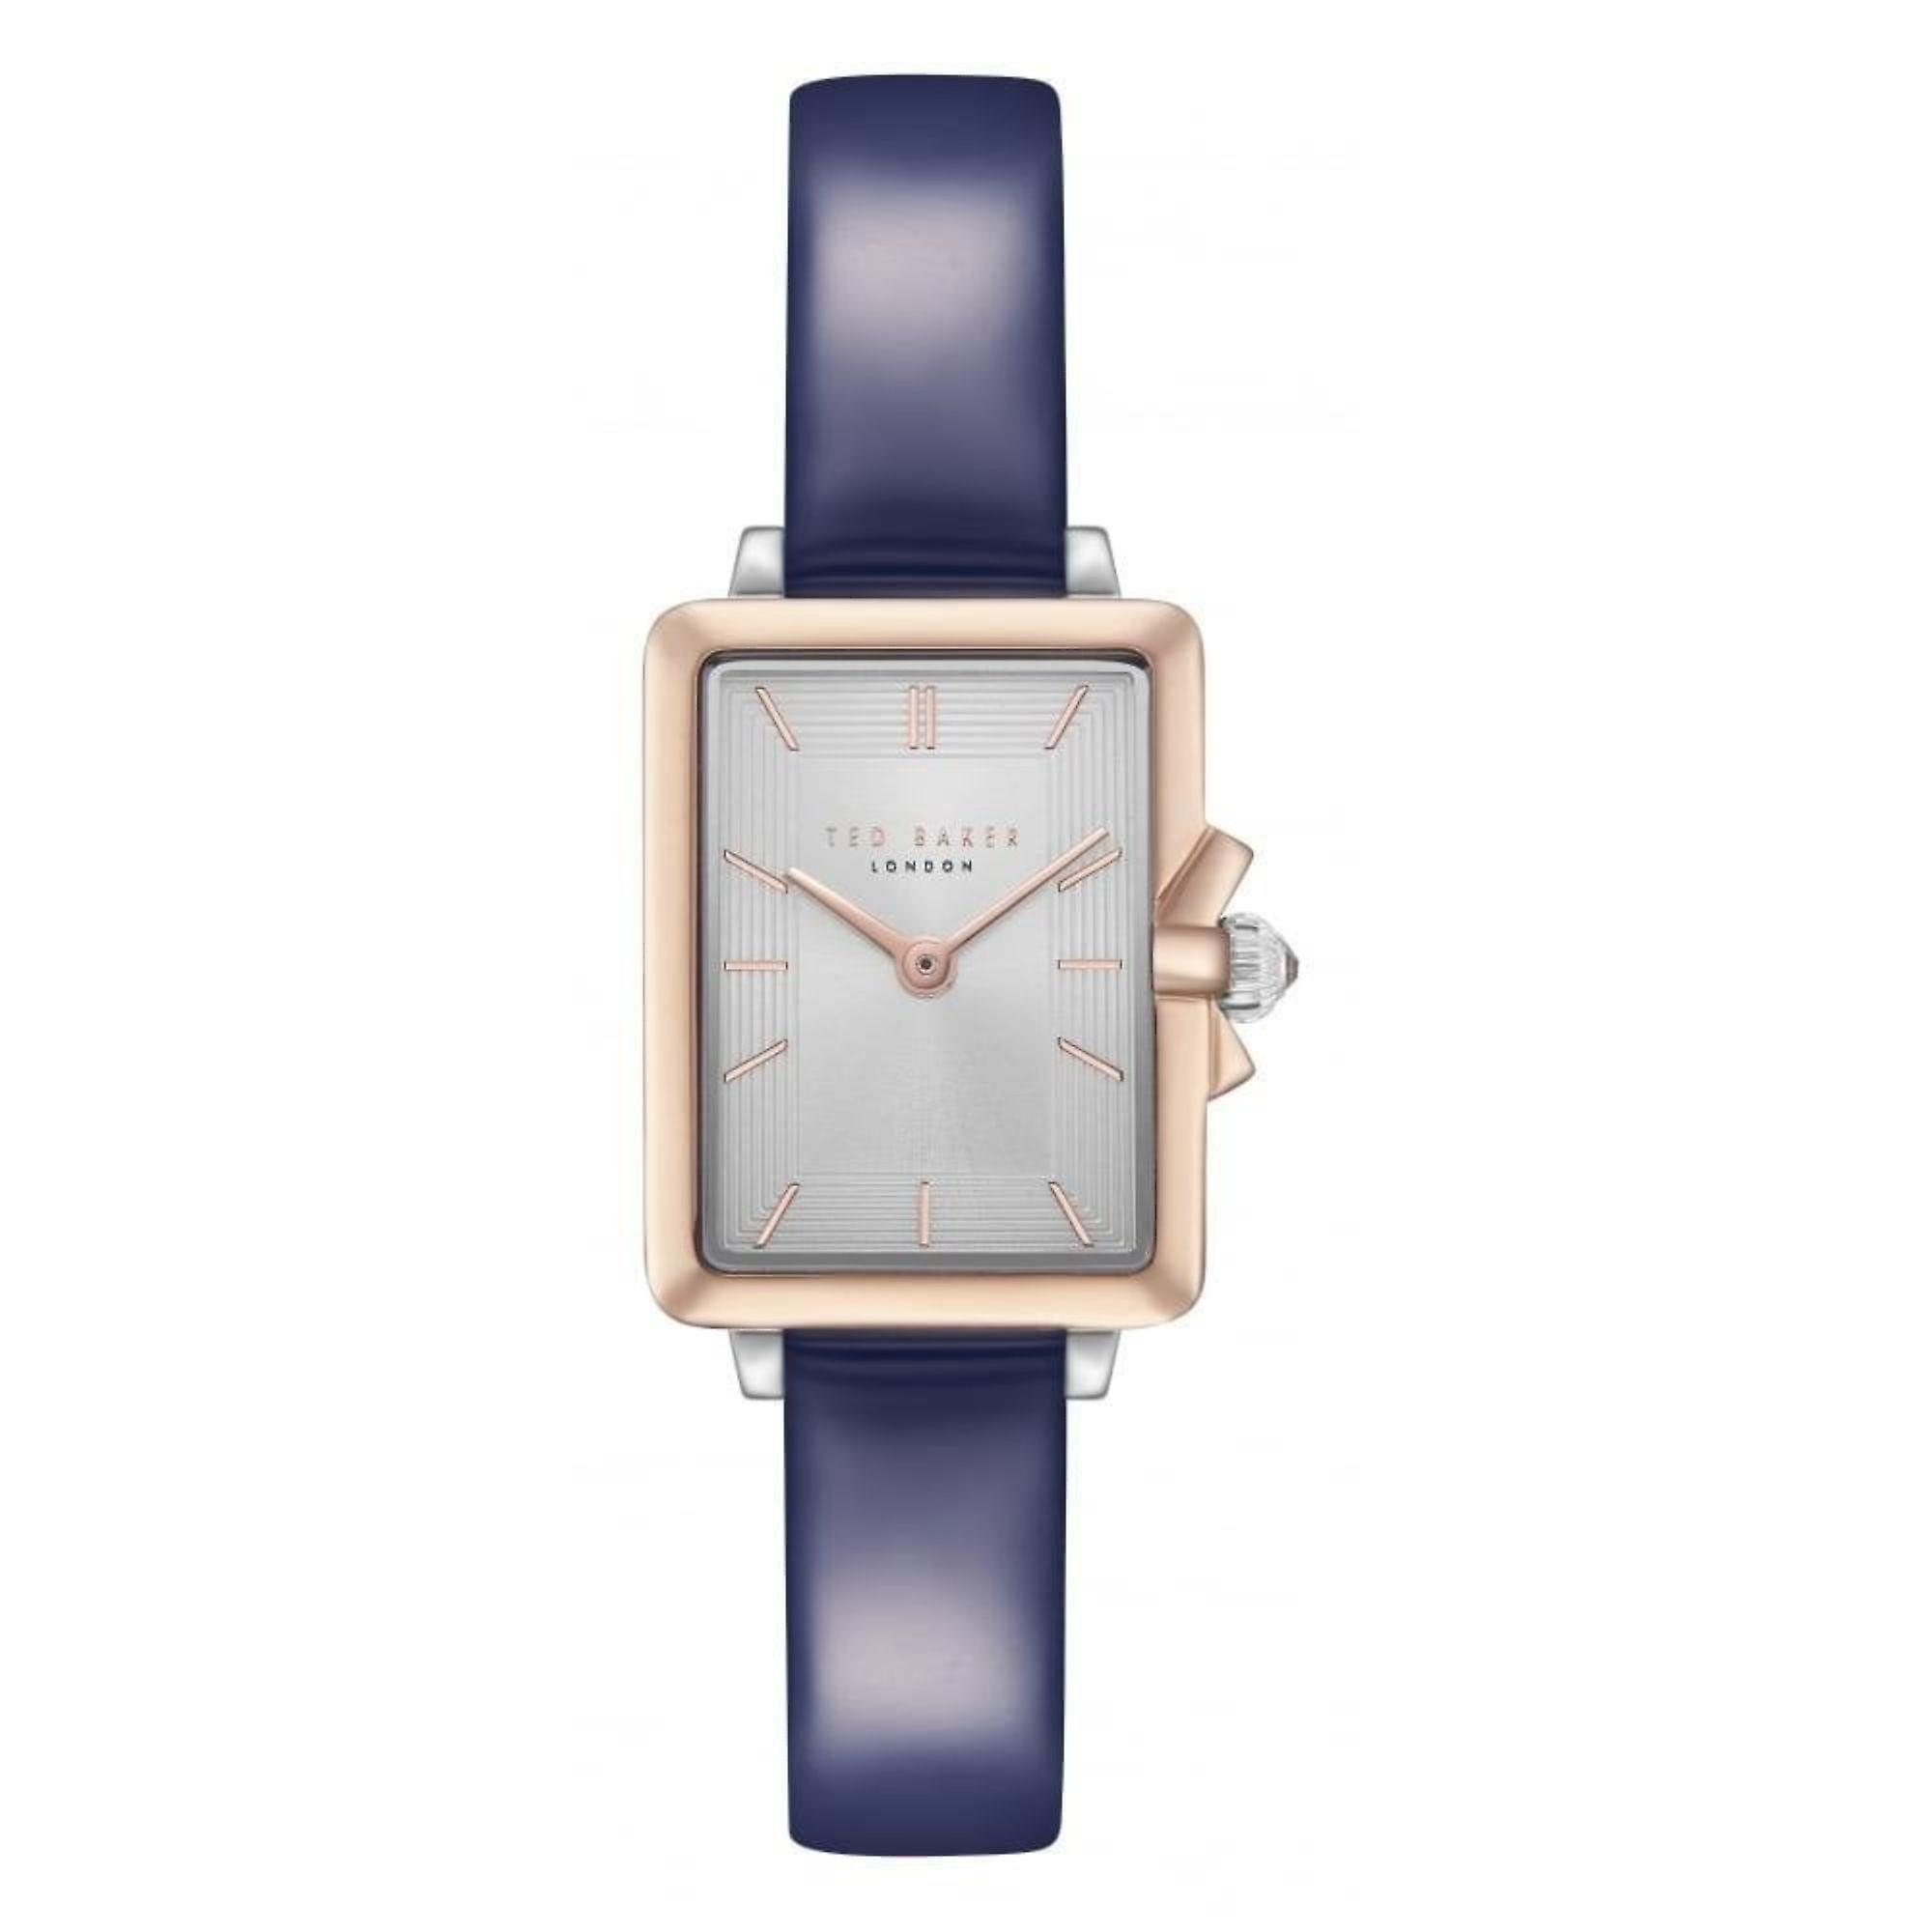 Ted Baker Tess Quartz Retro Silver Dial Blue Leather Strap Ladies Watch TE50271002